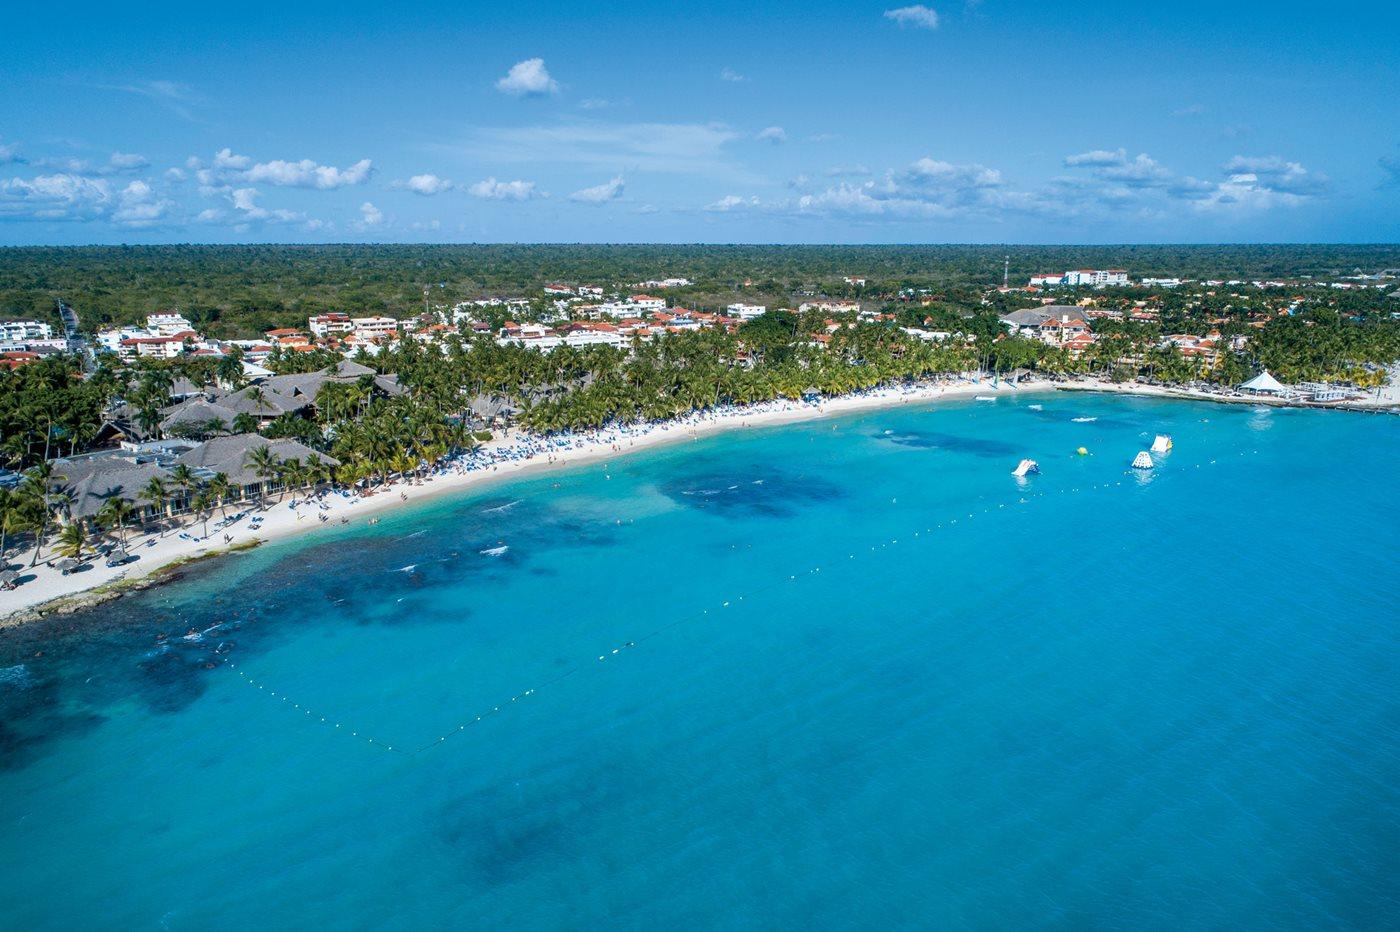 Viva Wyndham Dominicus Beach La Romana Transat